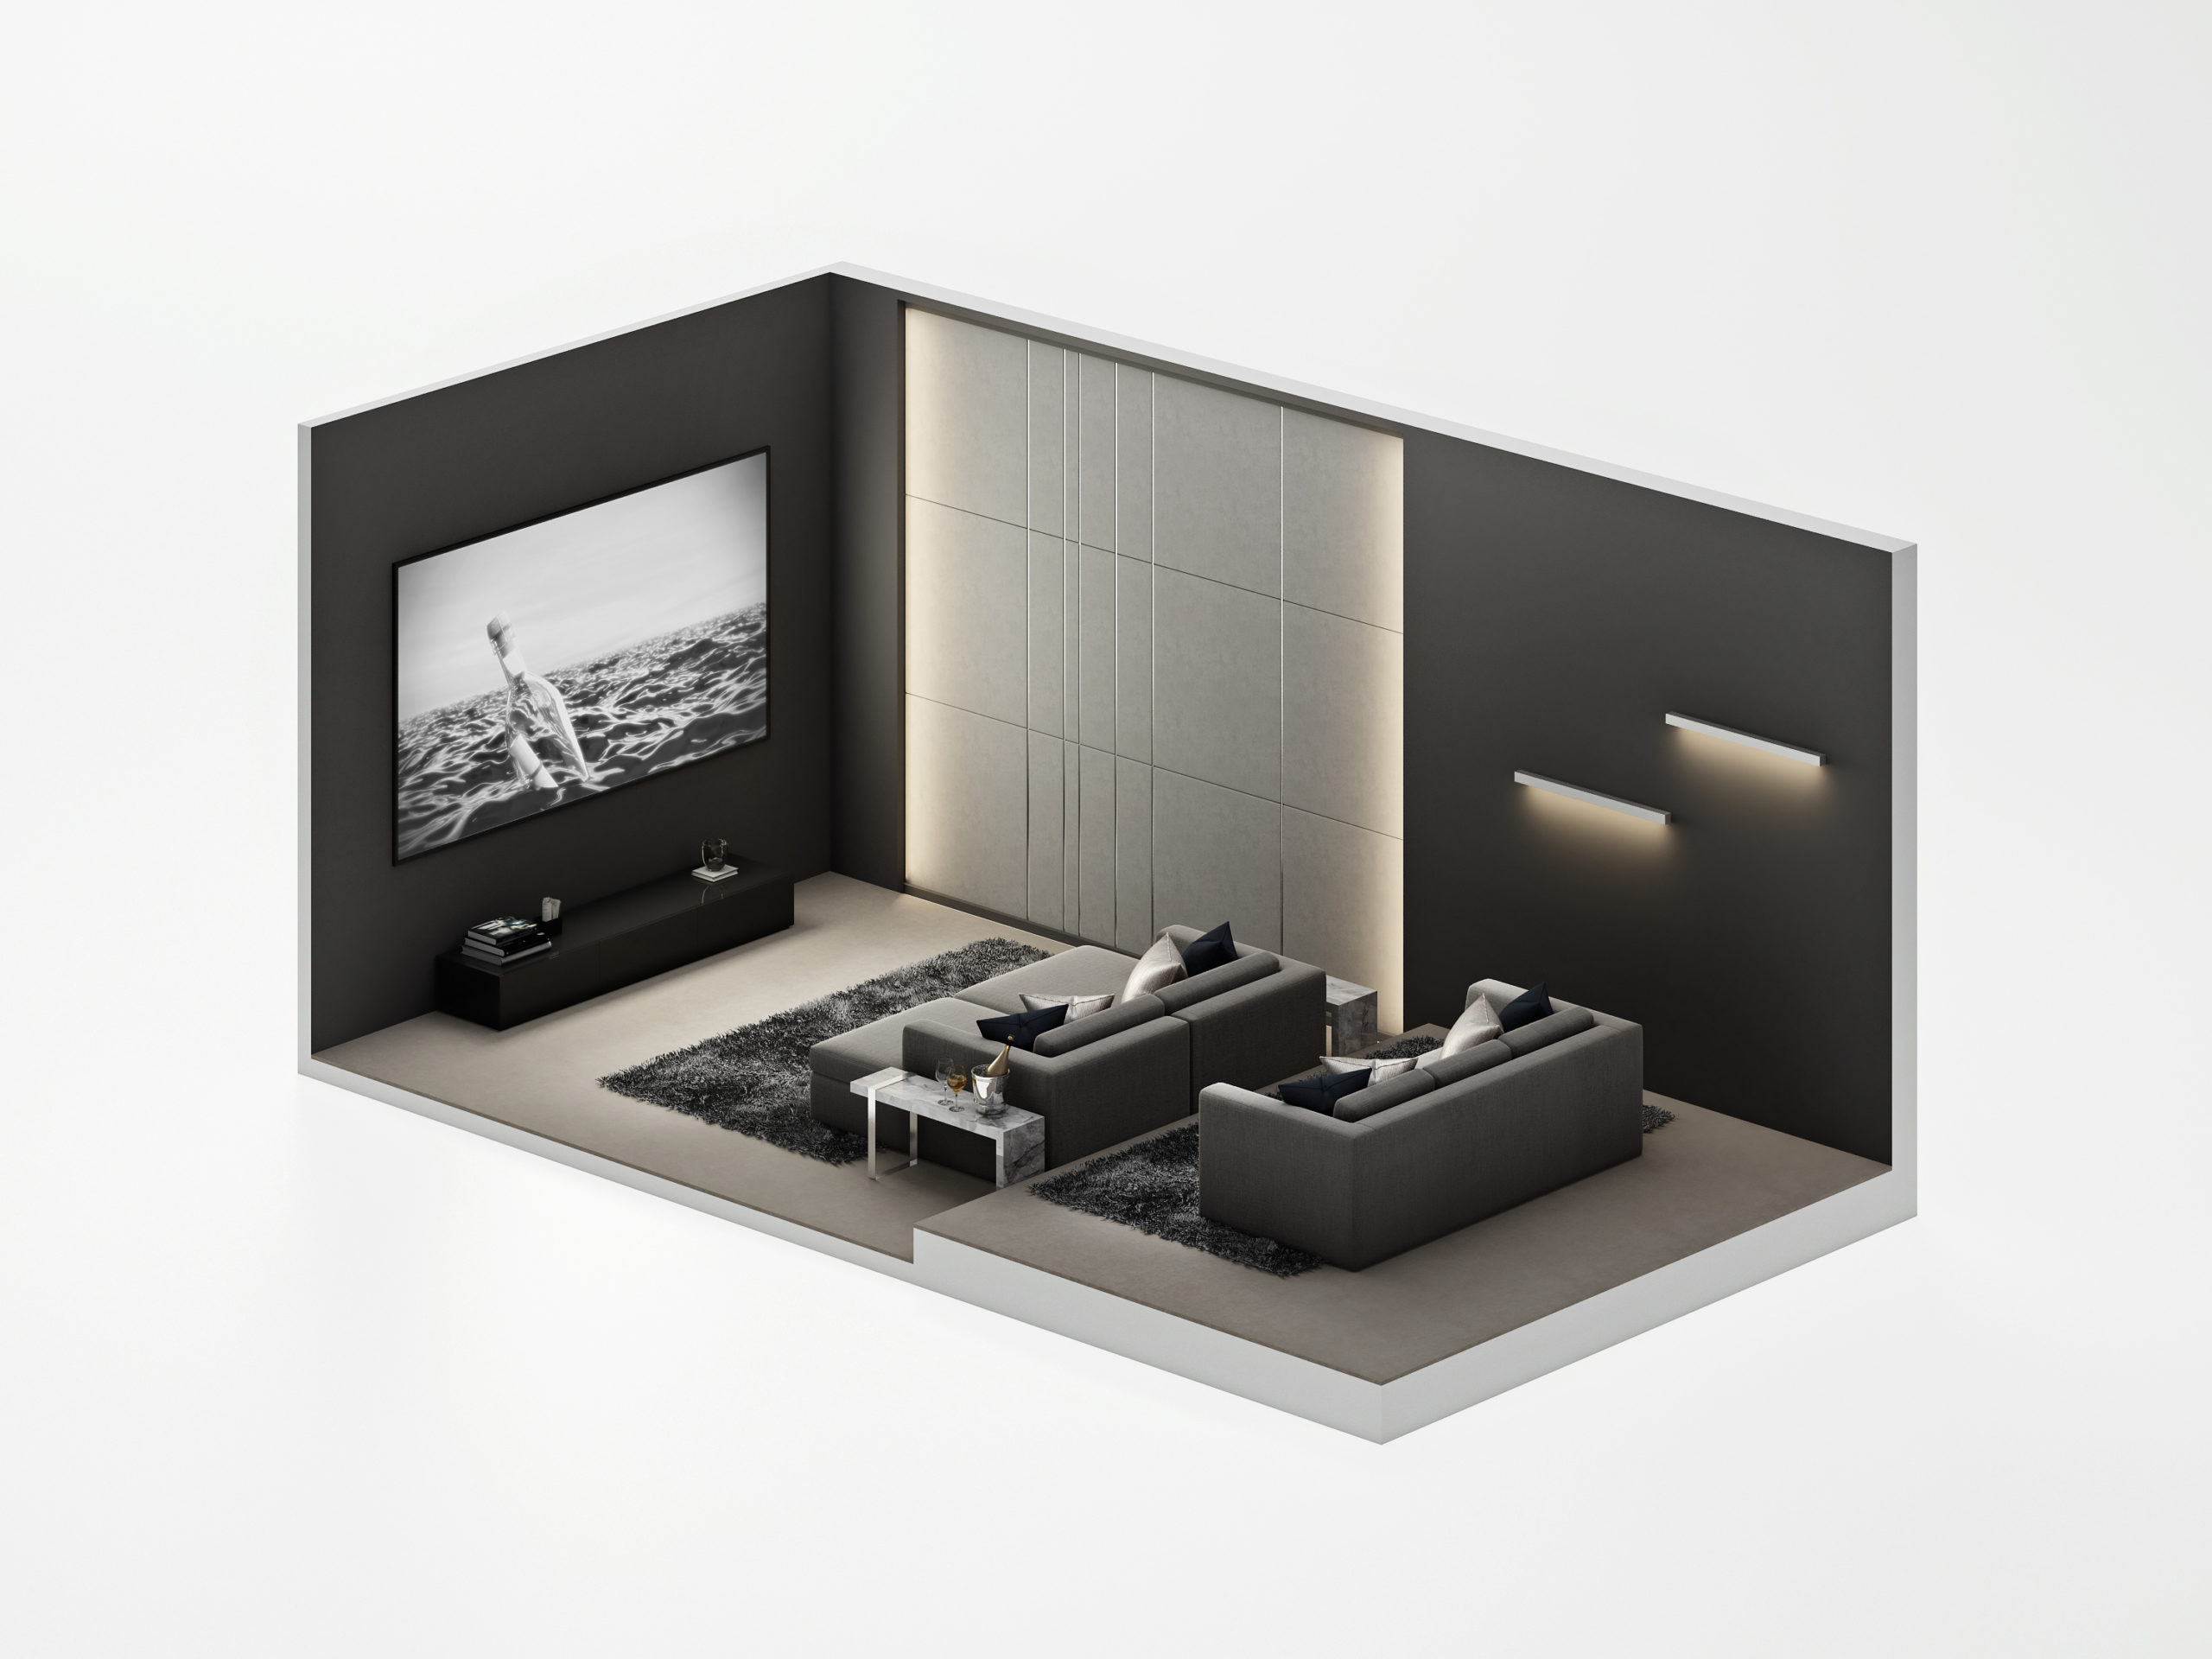 cinema-room-creating-the-perfect-home-cinema-room